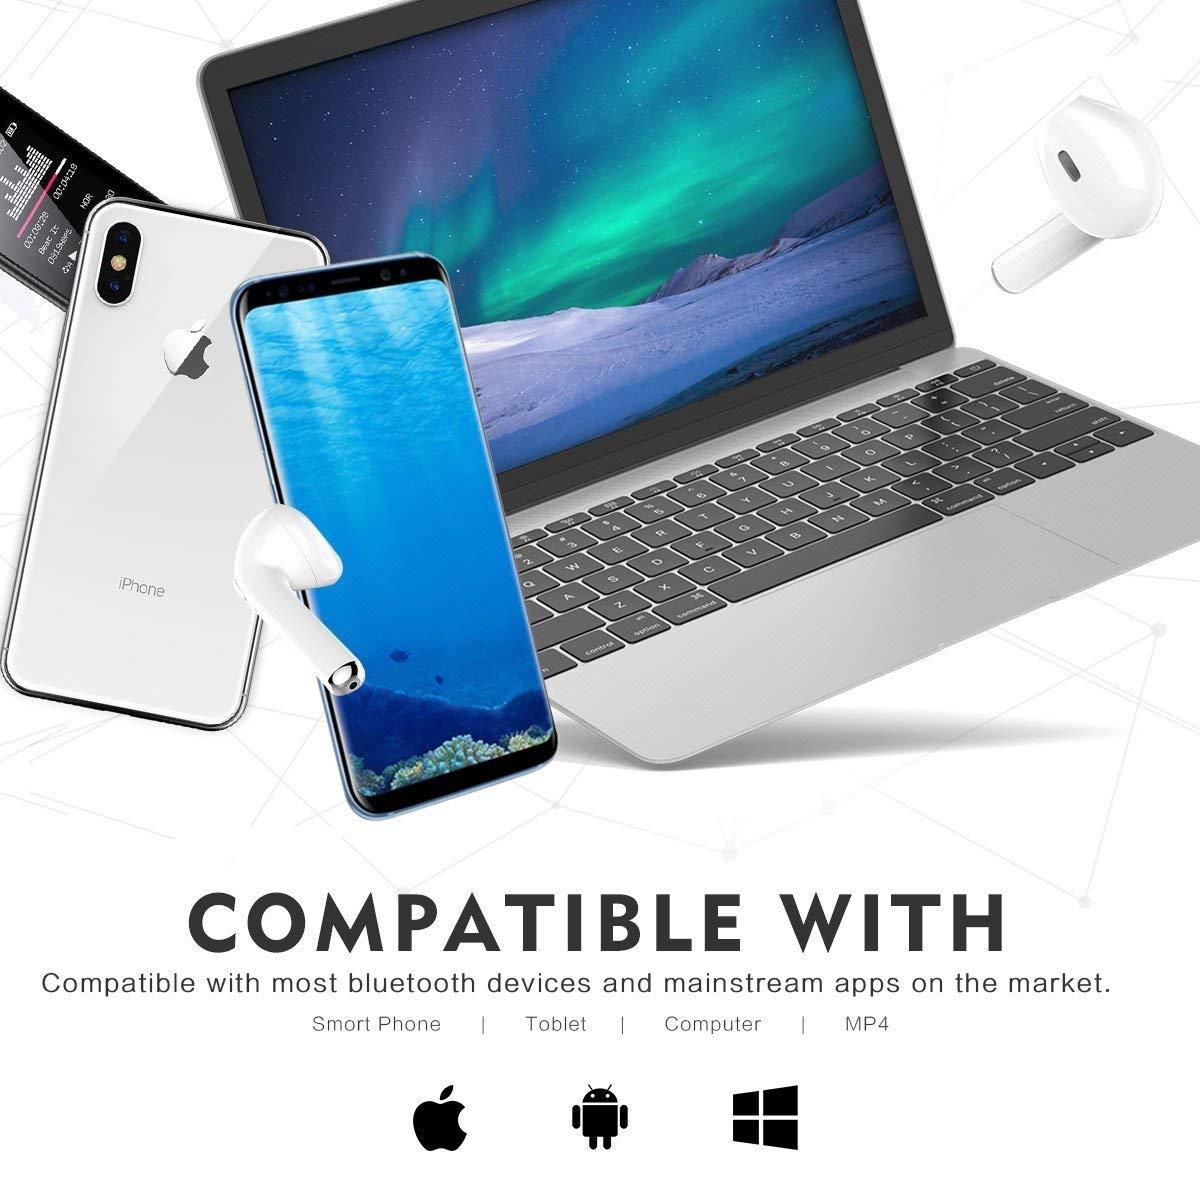 Auriculares Bluetooth Auriculares inalámbricos con Estuche de Carga para XR XS X 8 7 6plus Samsung Galaxy S9 S8 Huawei y Otros teléfonos Inteligentes iOS ...